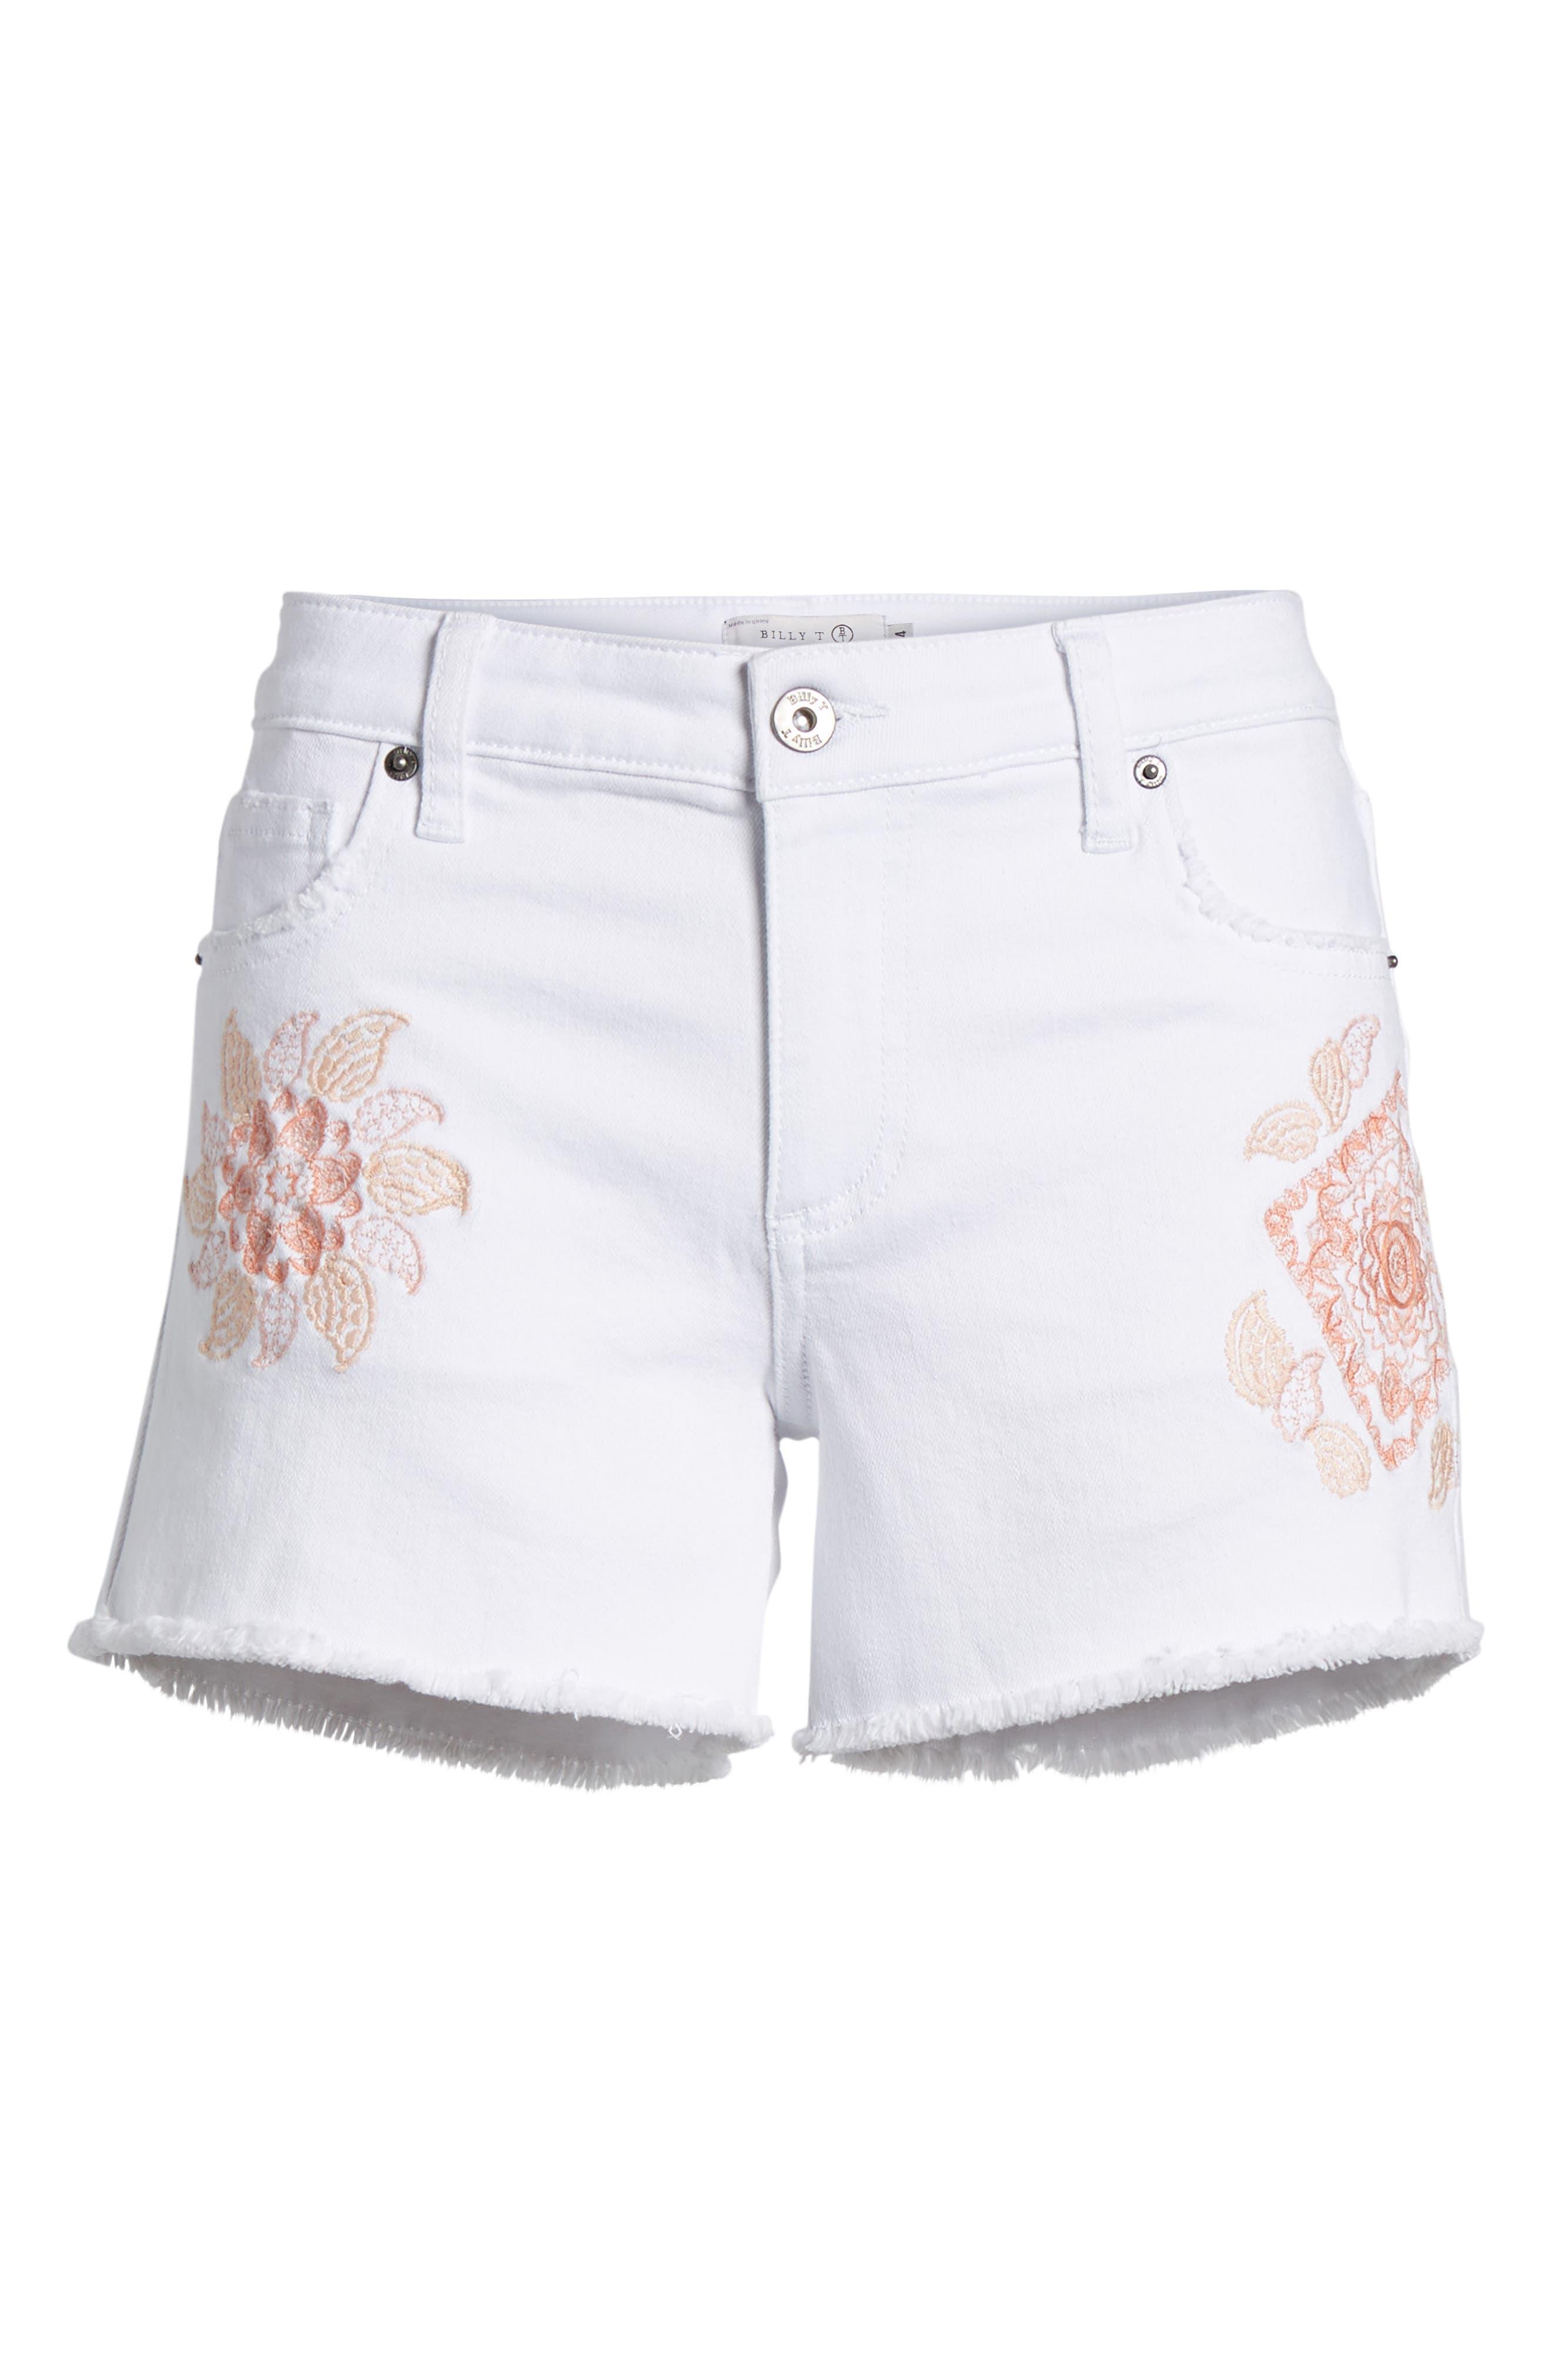 Embroidered Denim Shorts,                             Alternate thumbnail 7, color,                             100